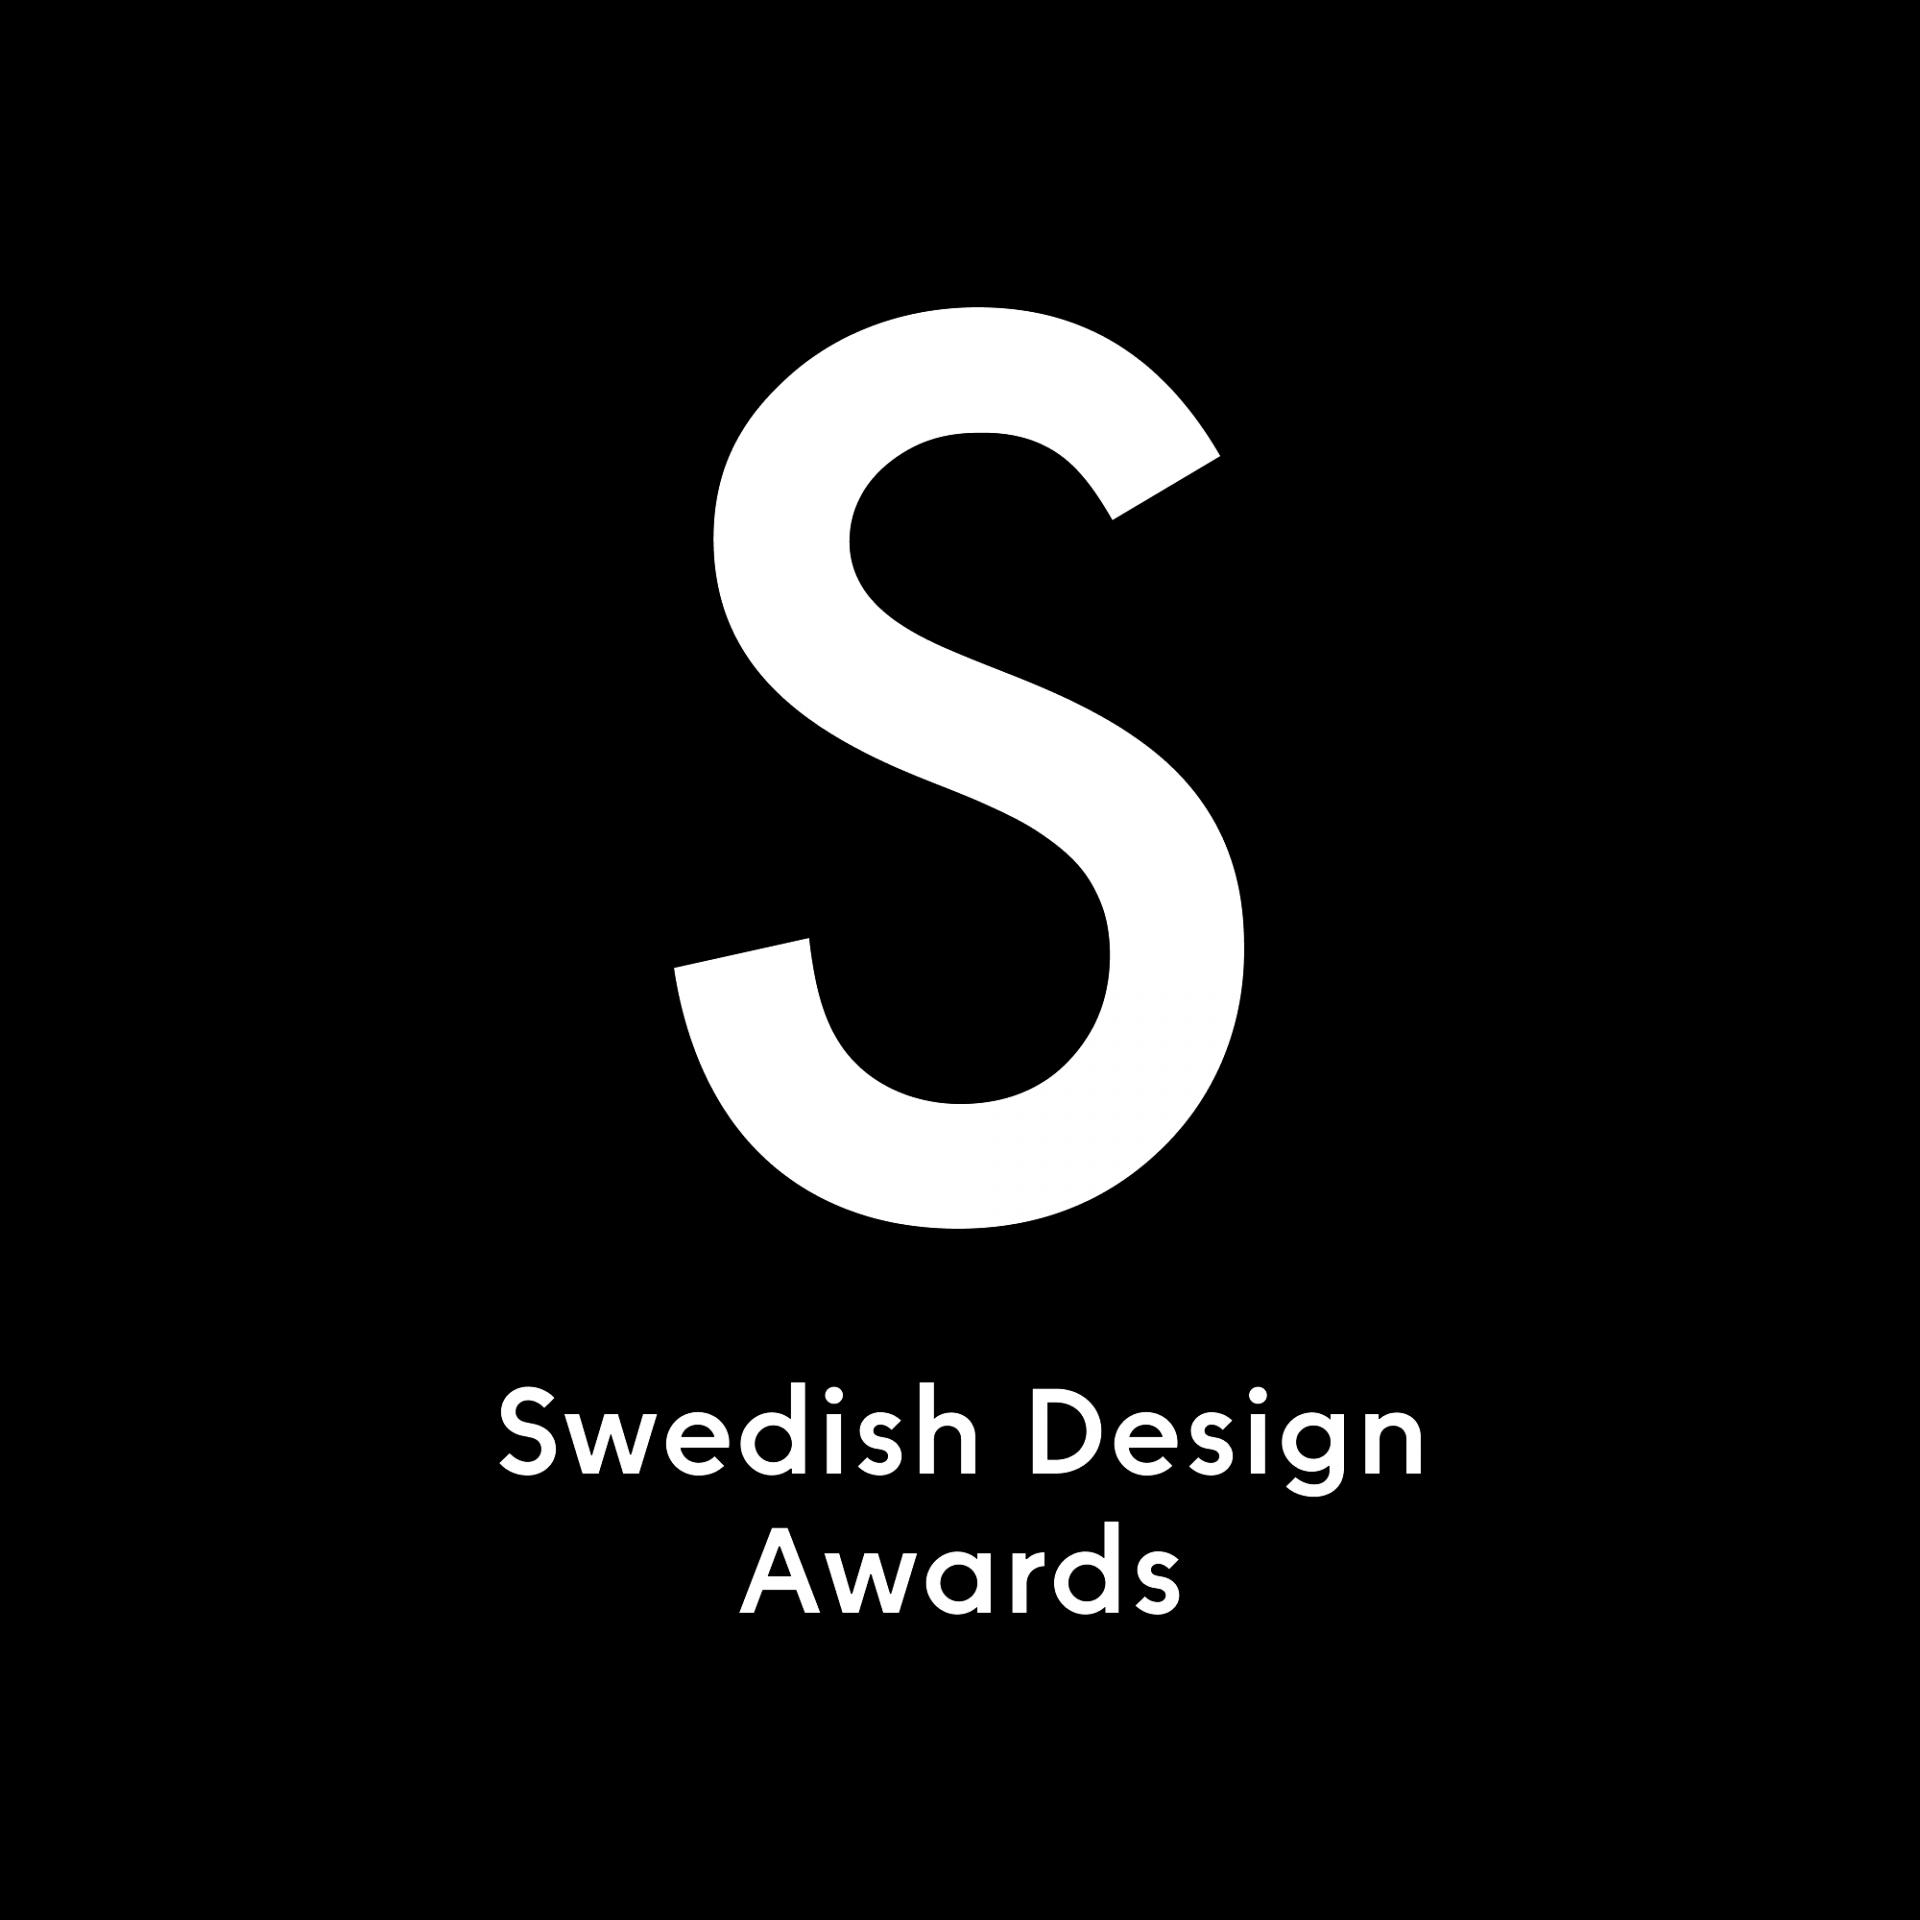 Design S - Swedish Design Awards